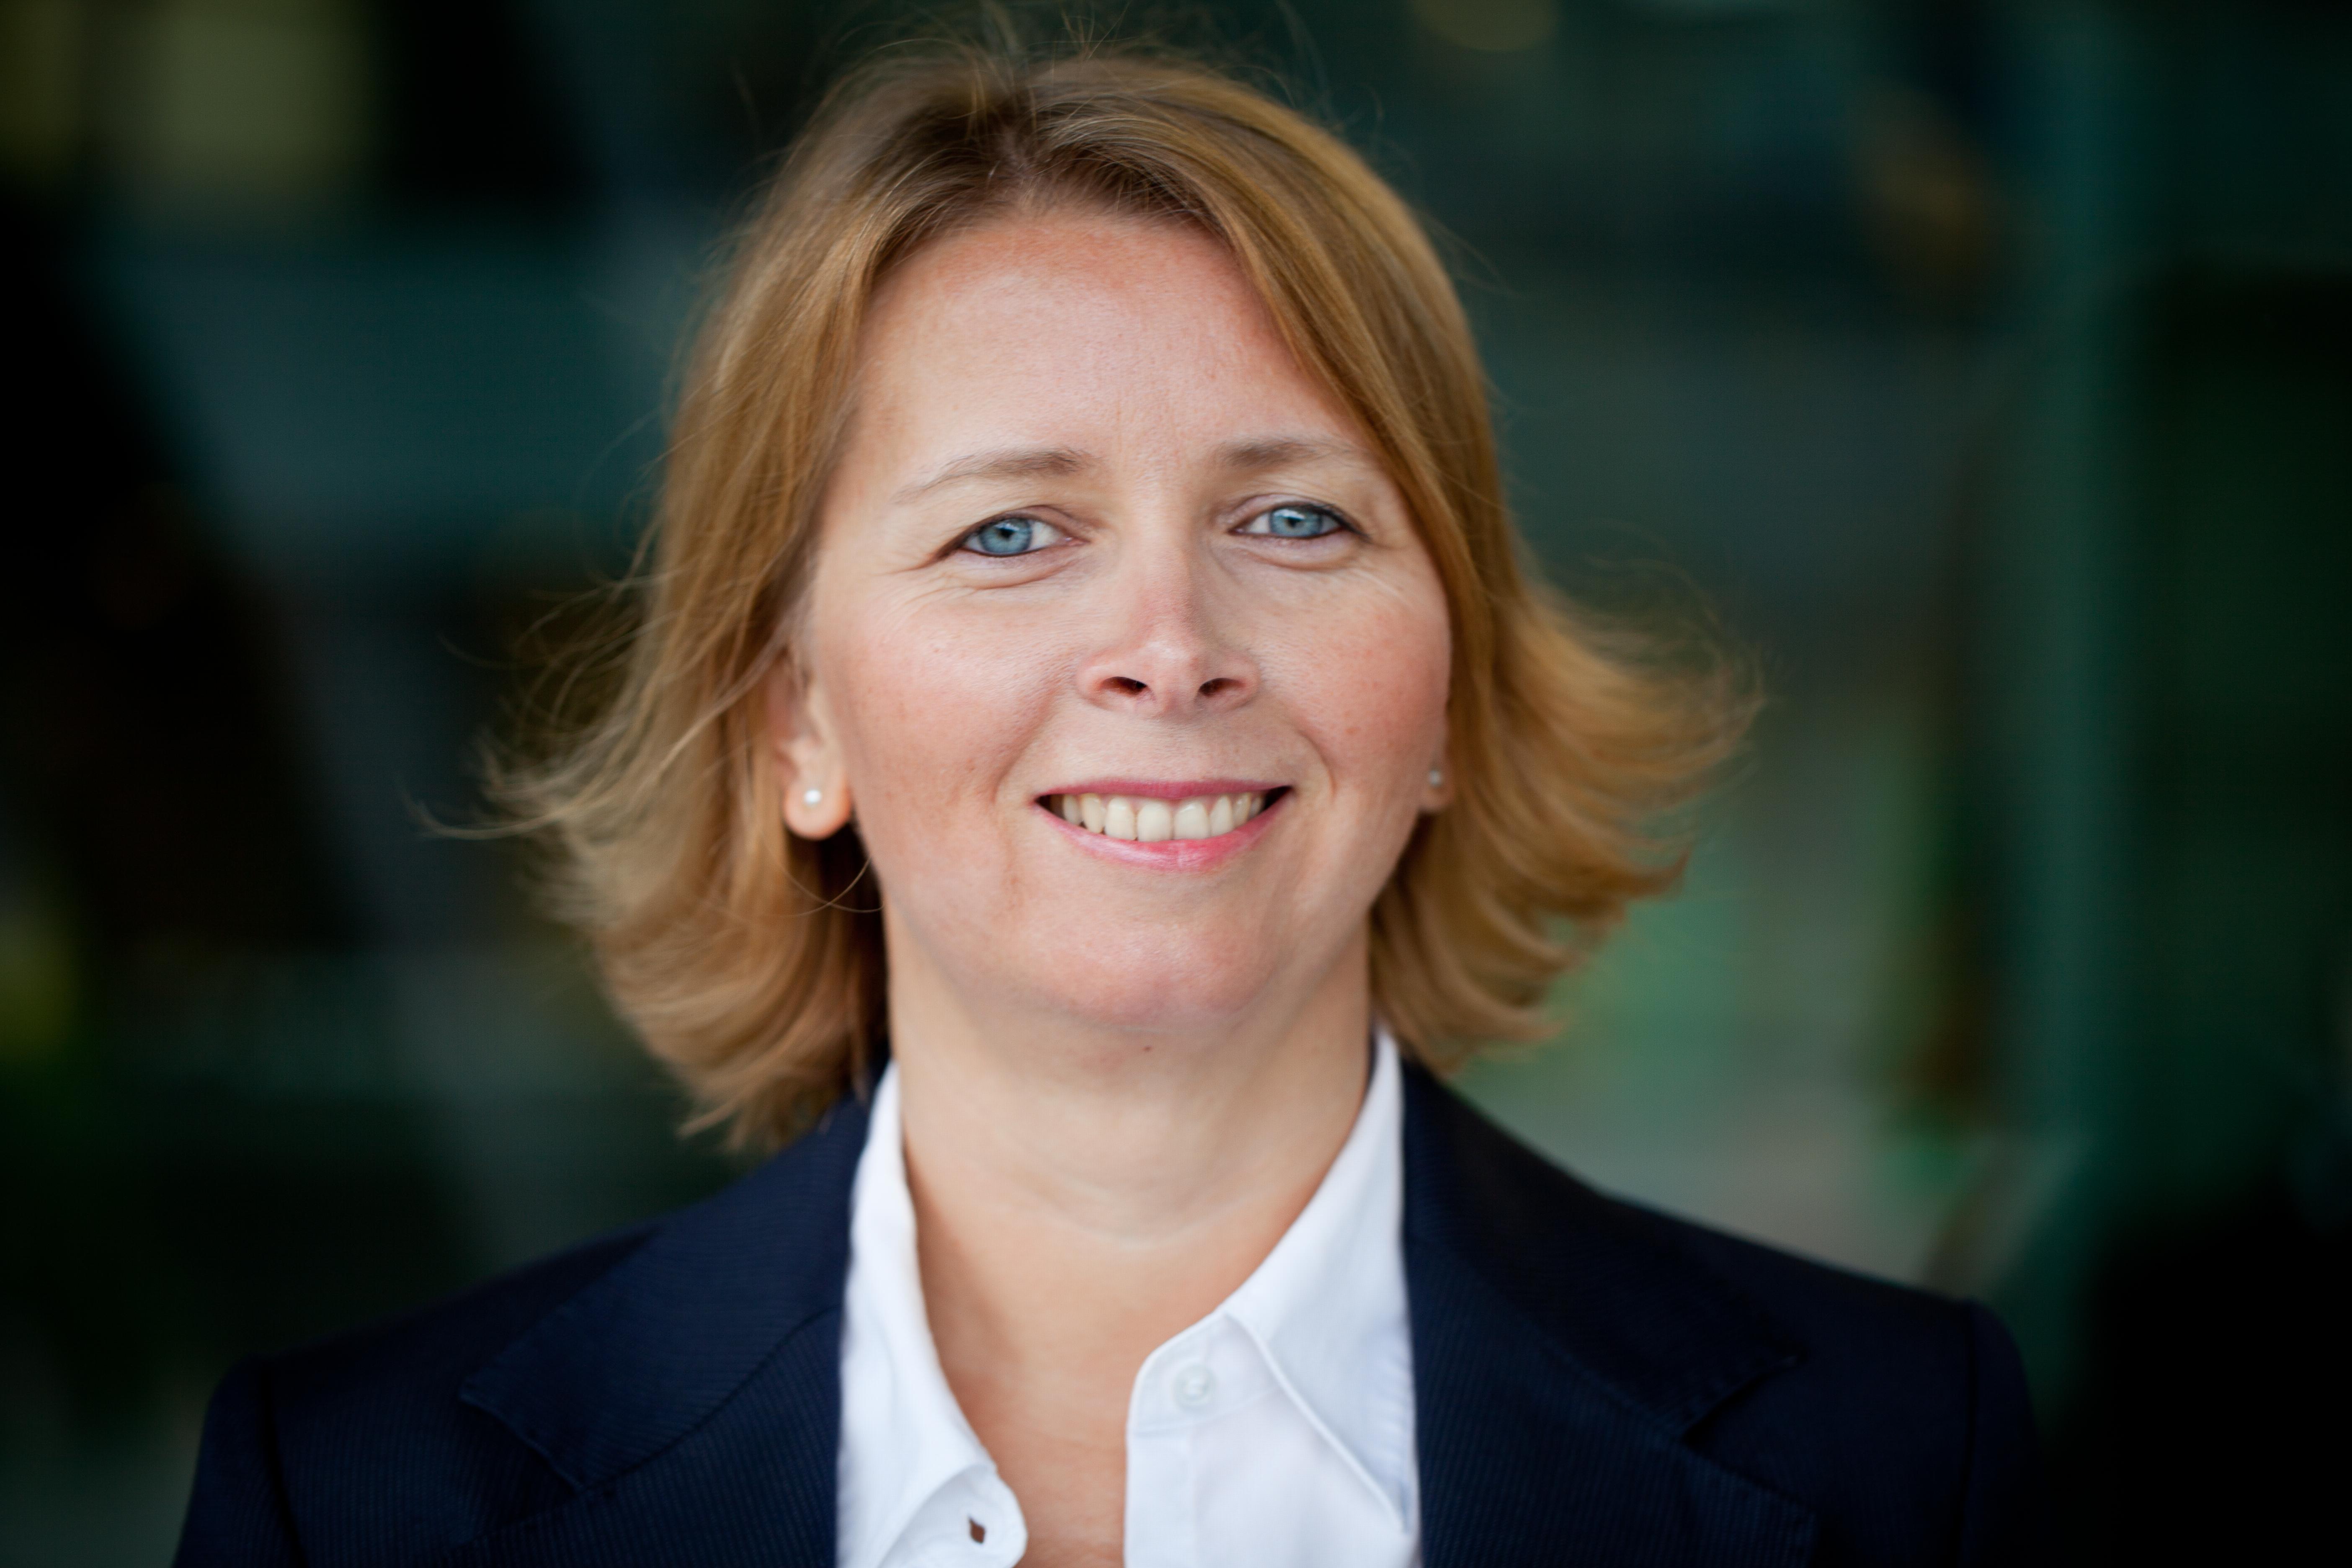 Karoline Nystrøm fra Telenor til Experis